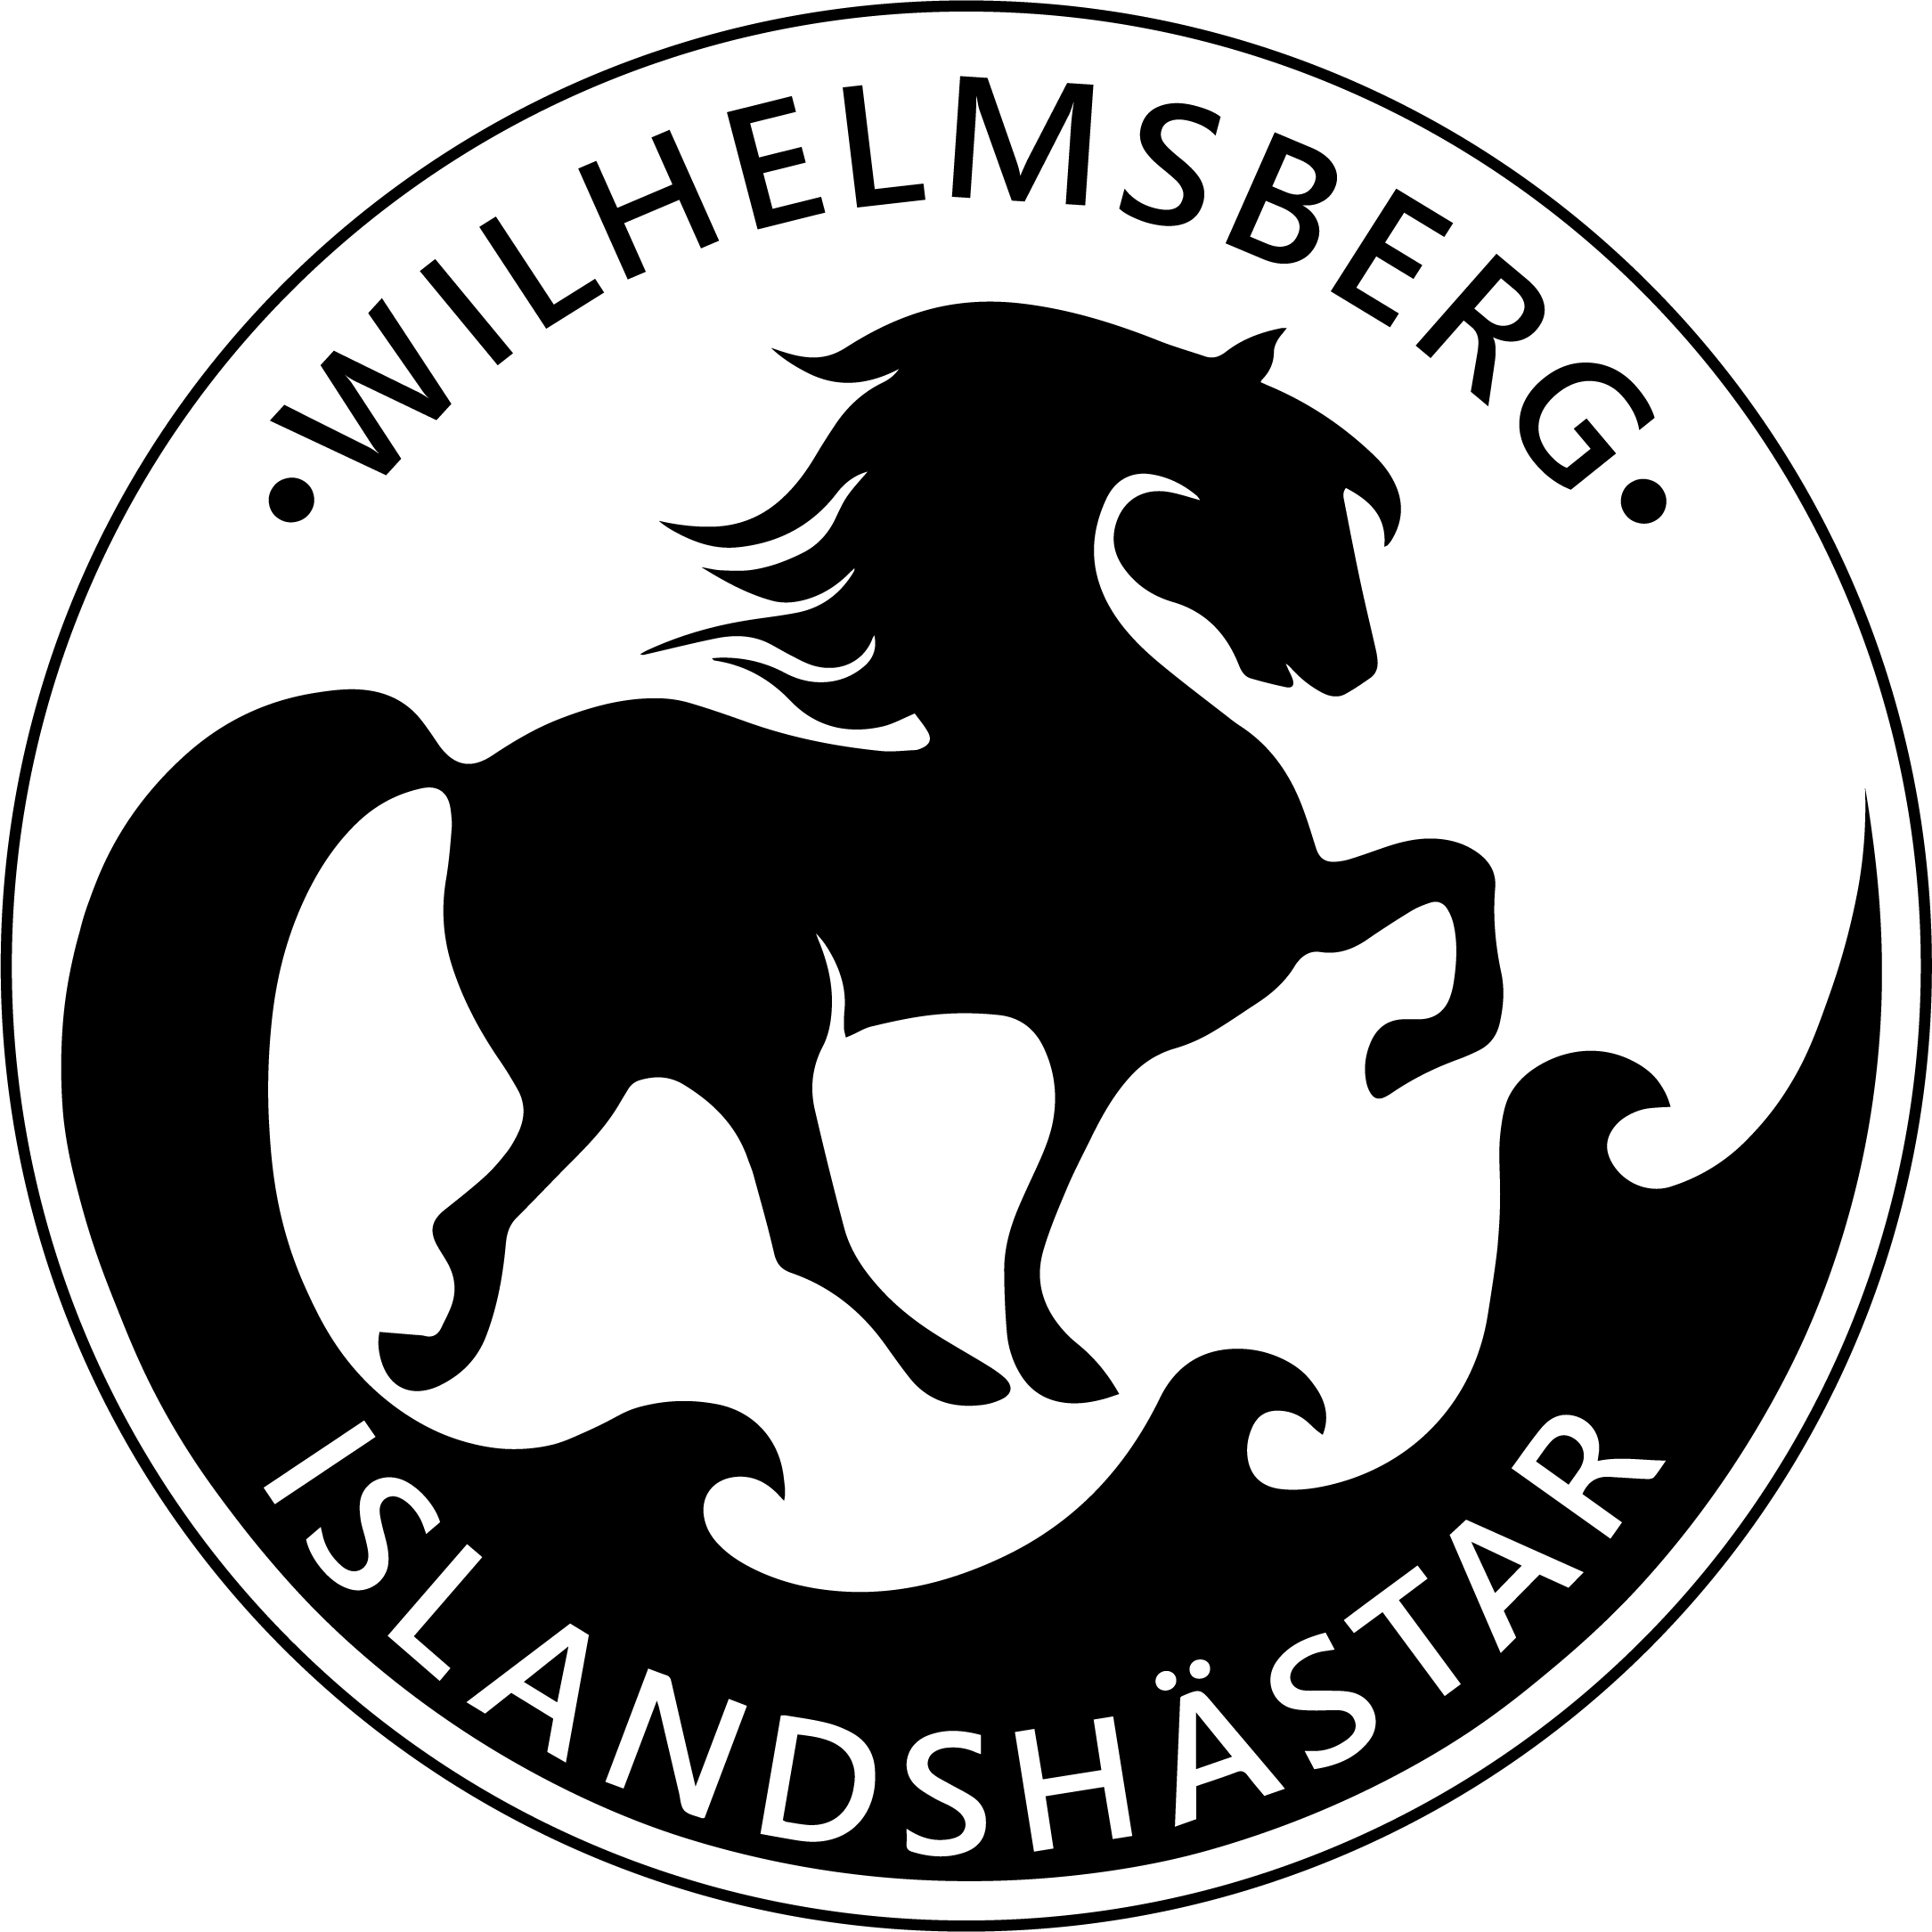 Wilhelmsberg